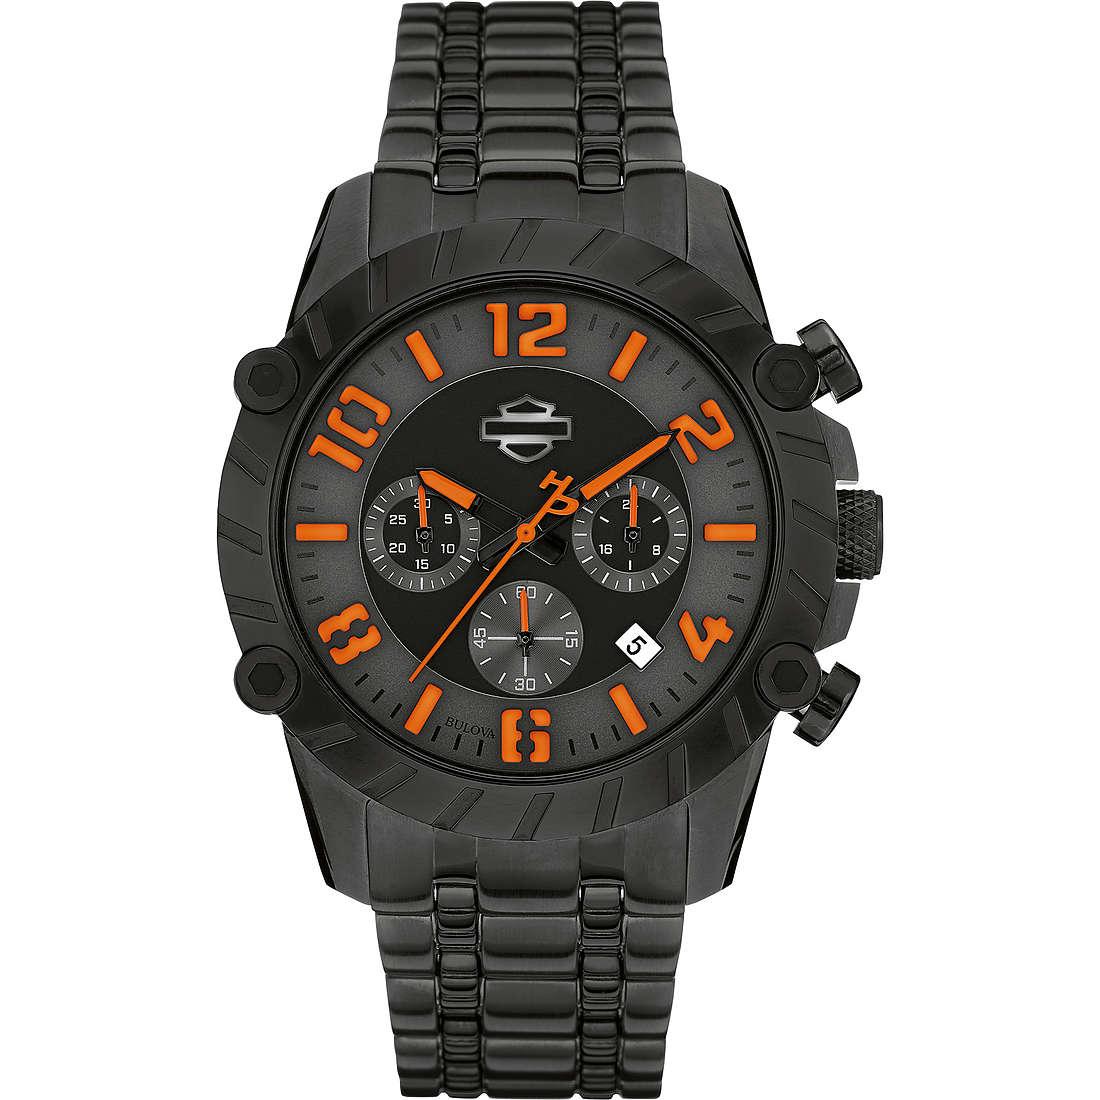 orologio cronografo uomo Harley Davidson 78B137